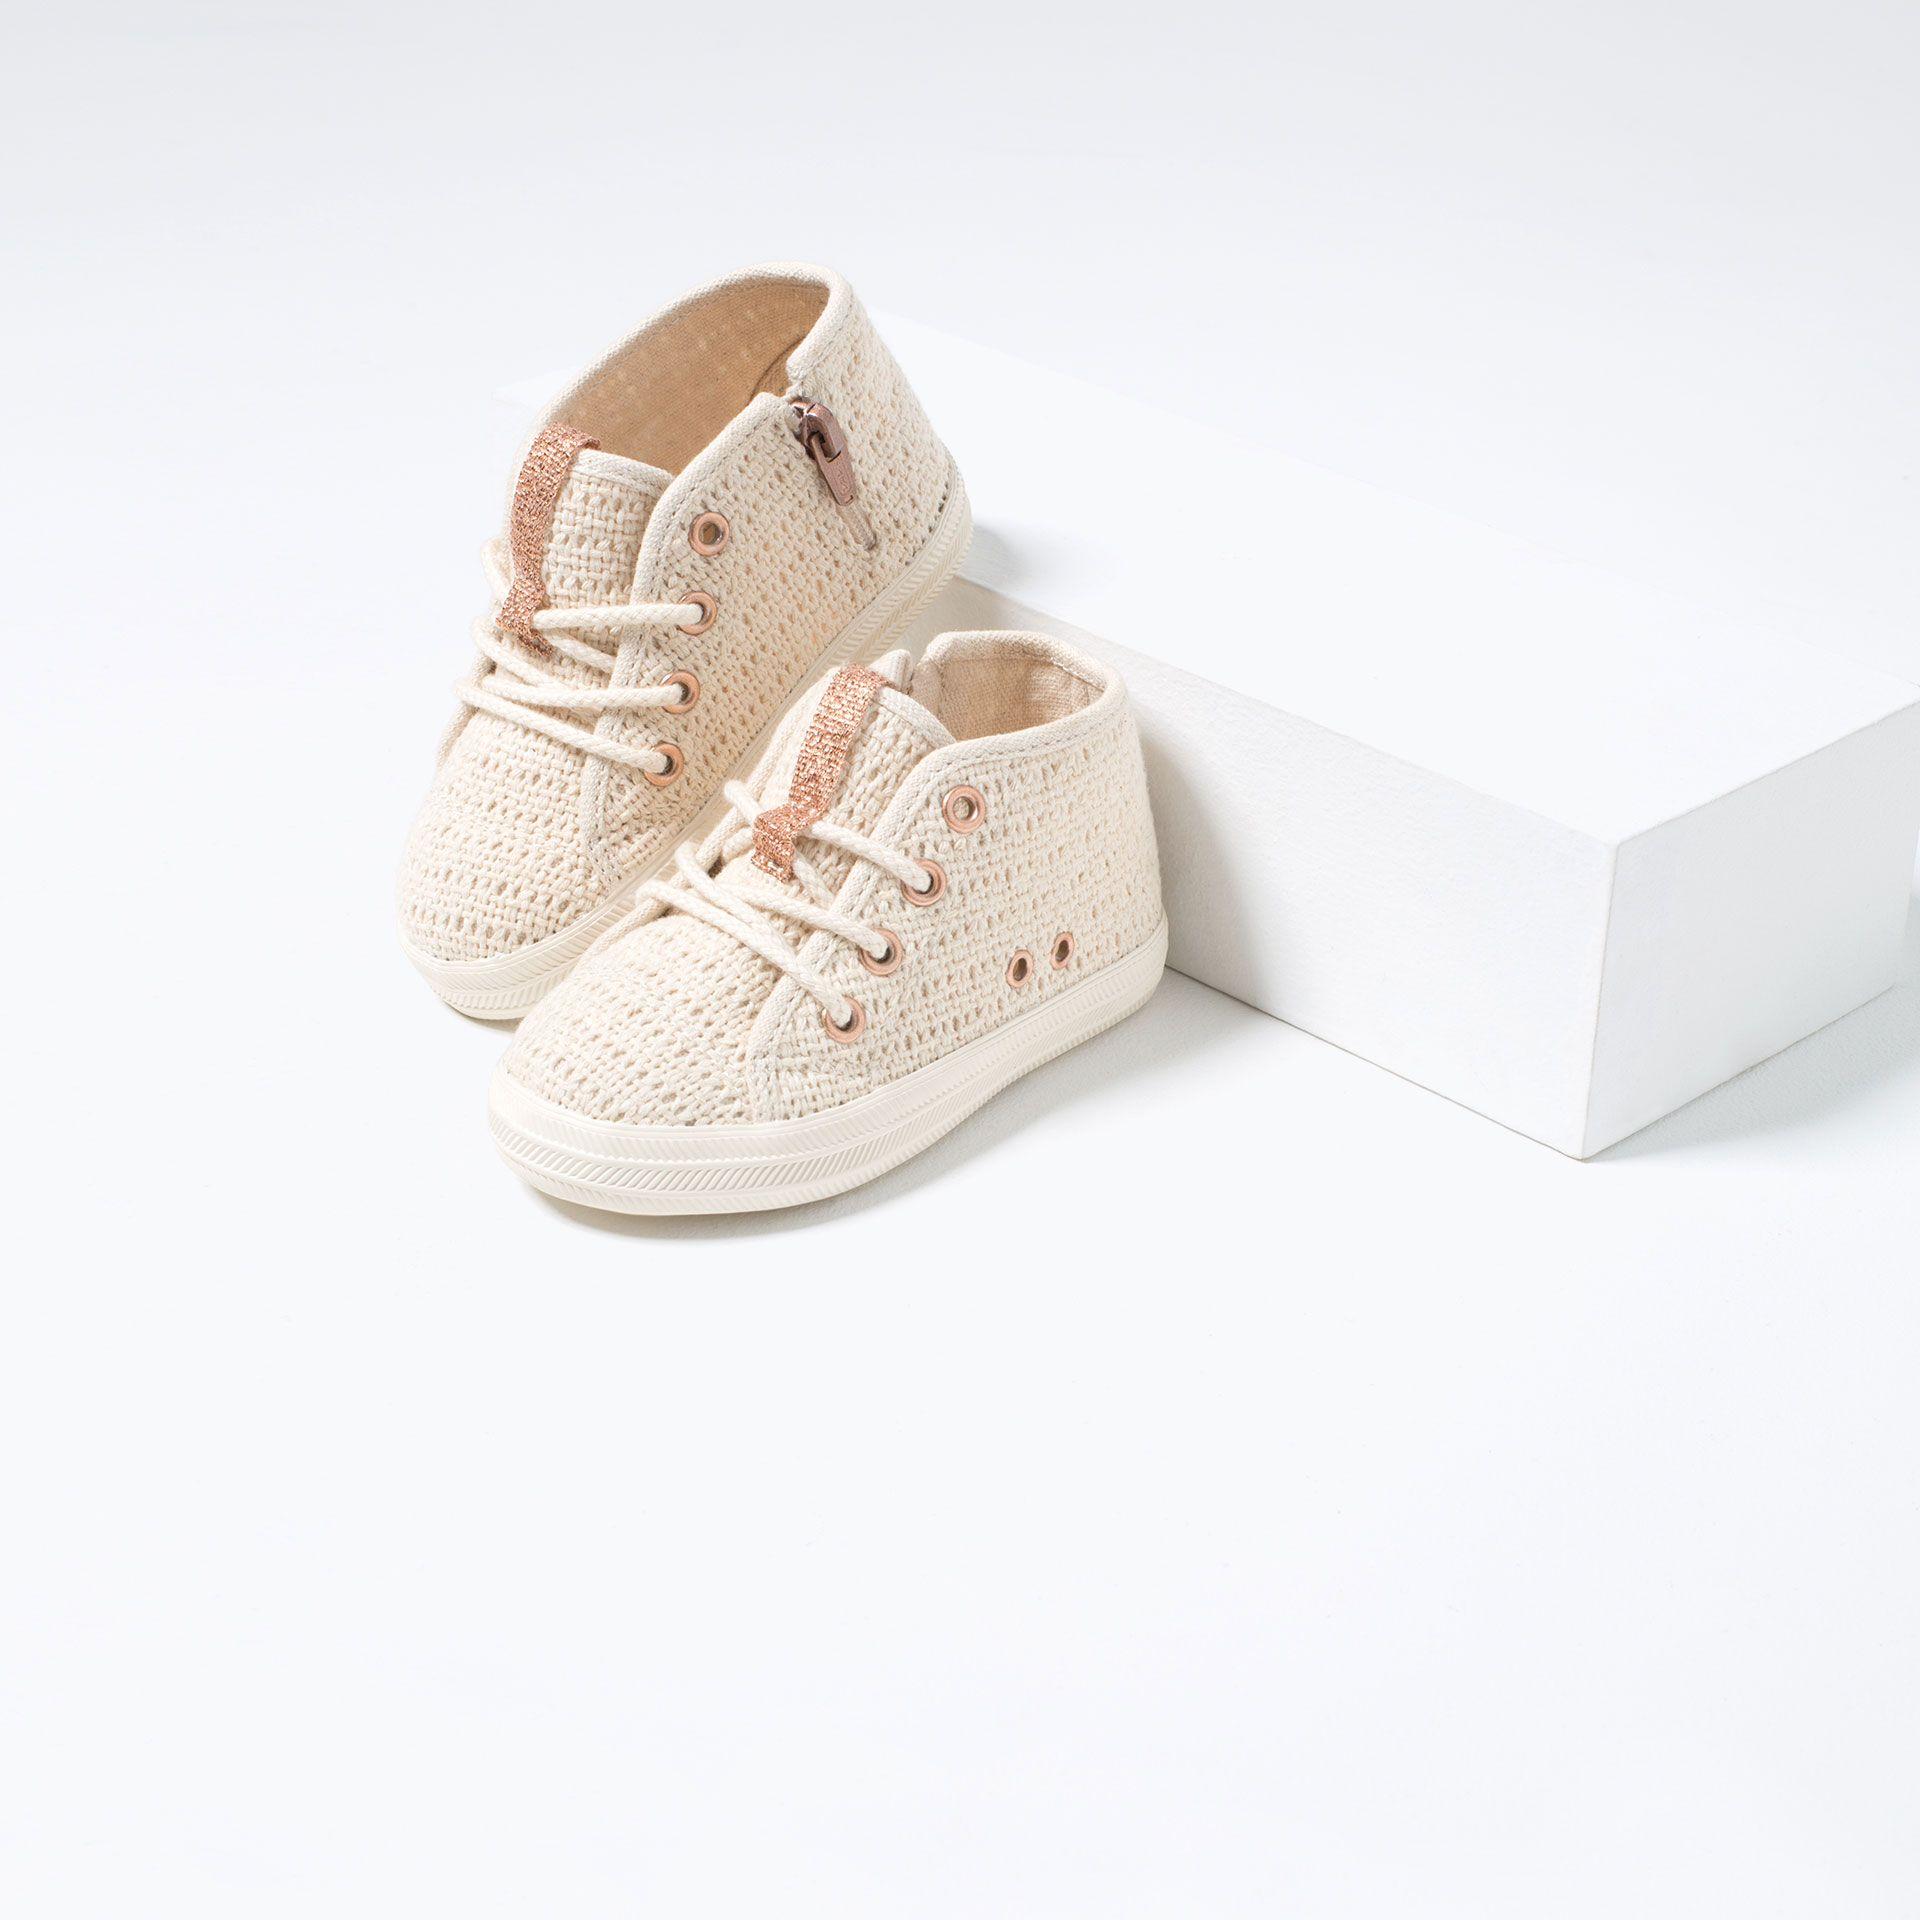 Blanc Chaussures Puma Platform Basket Big Velcro 9H2WEDIY